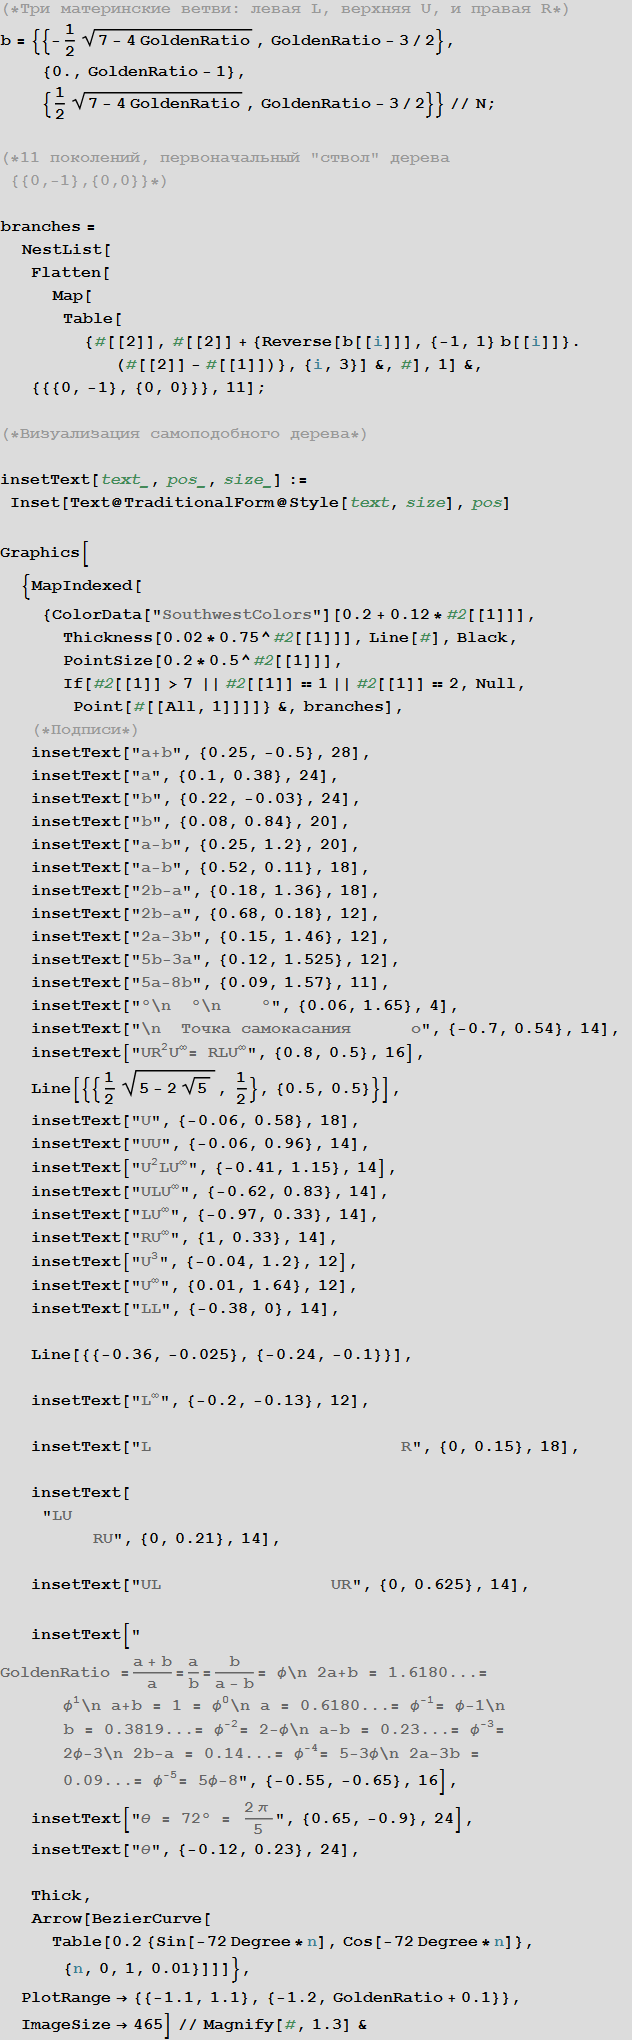 Prikljuchenija-v-matematicheskom-lesu-fraktalnyh-derevev_6.png